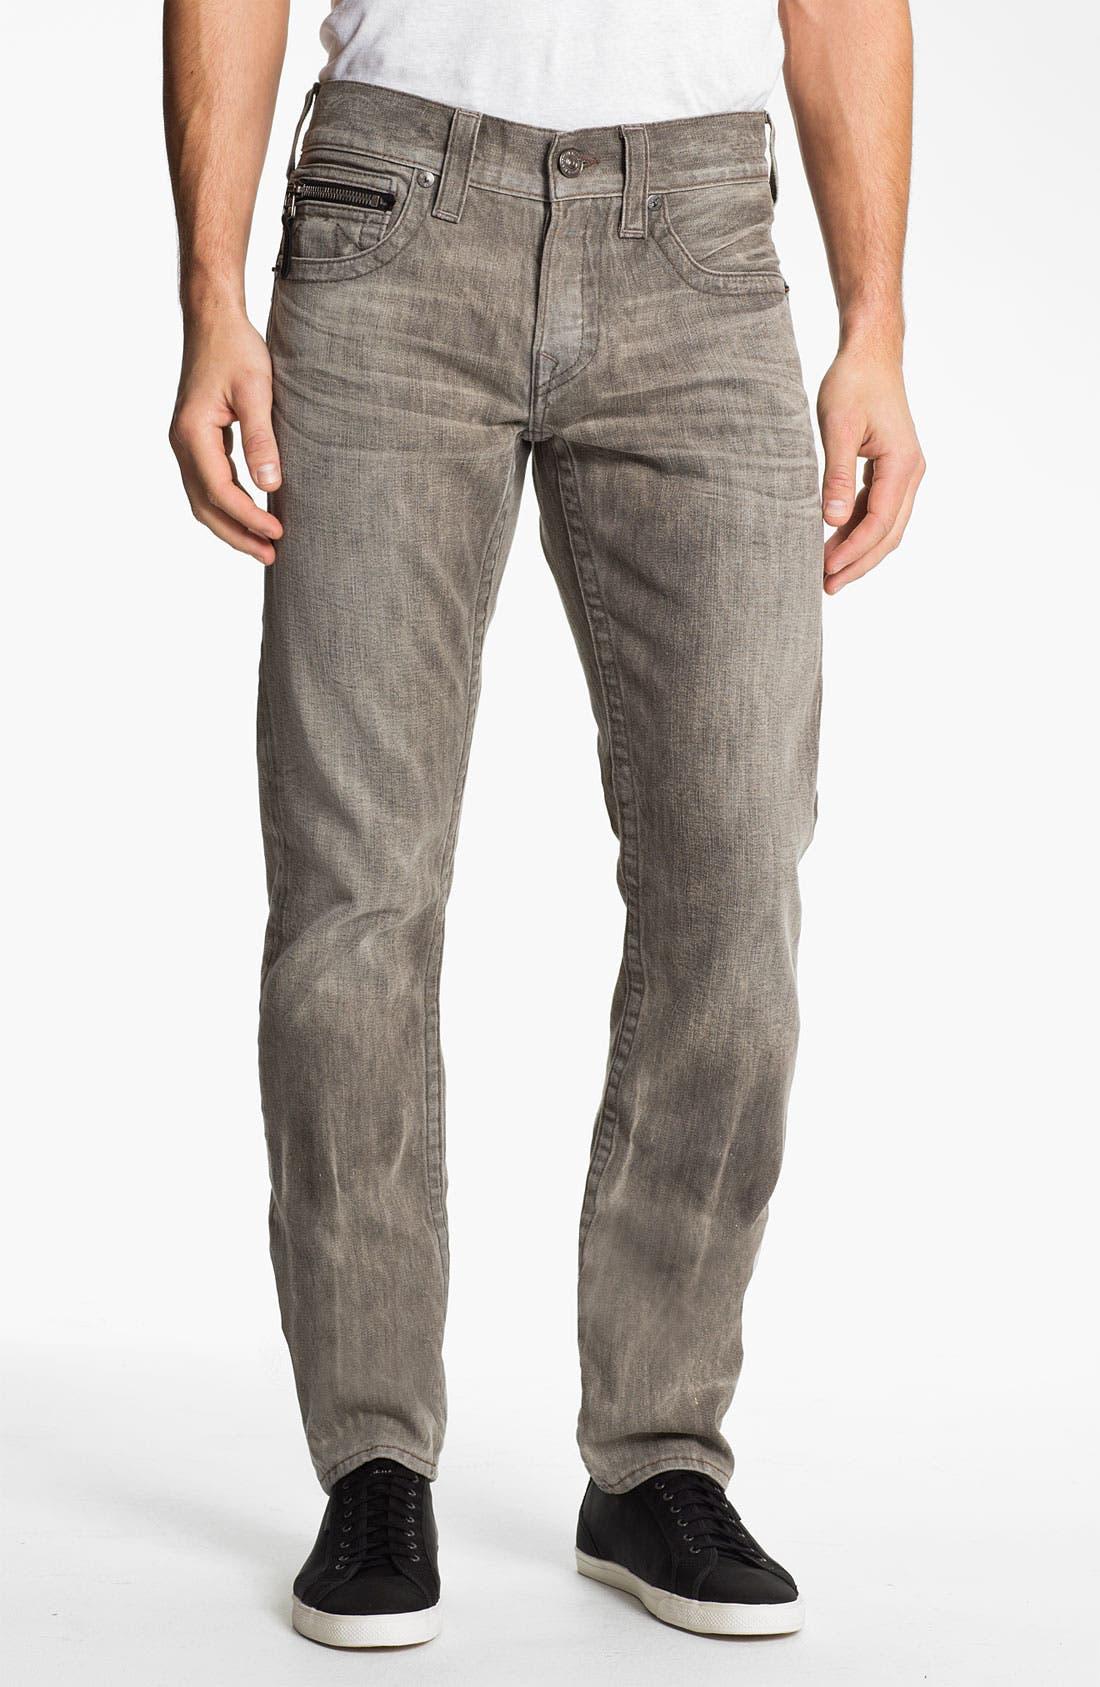 Alternate Image 2  - True Religion Brand Jeans 'Rocco' Slim Straight Leg Jeans (Ashland) (Online Exclusive)